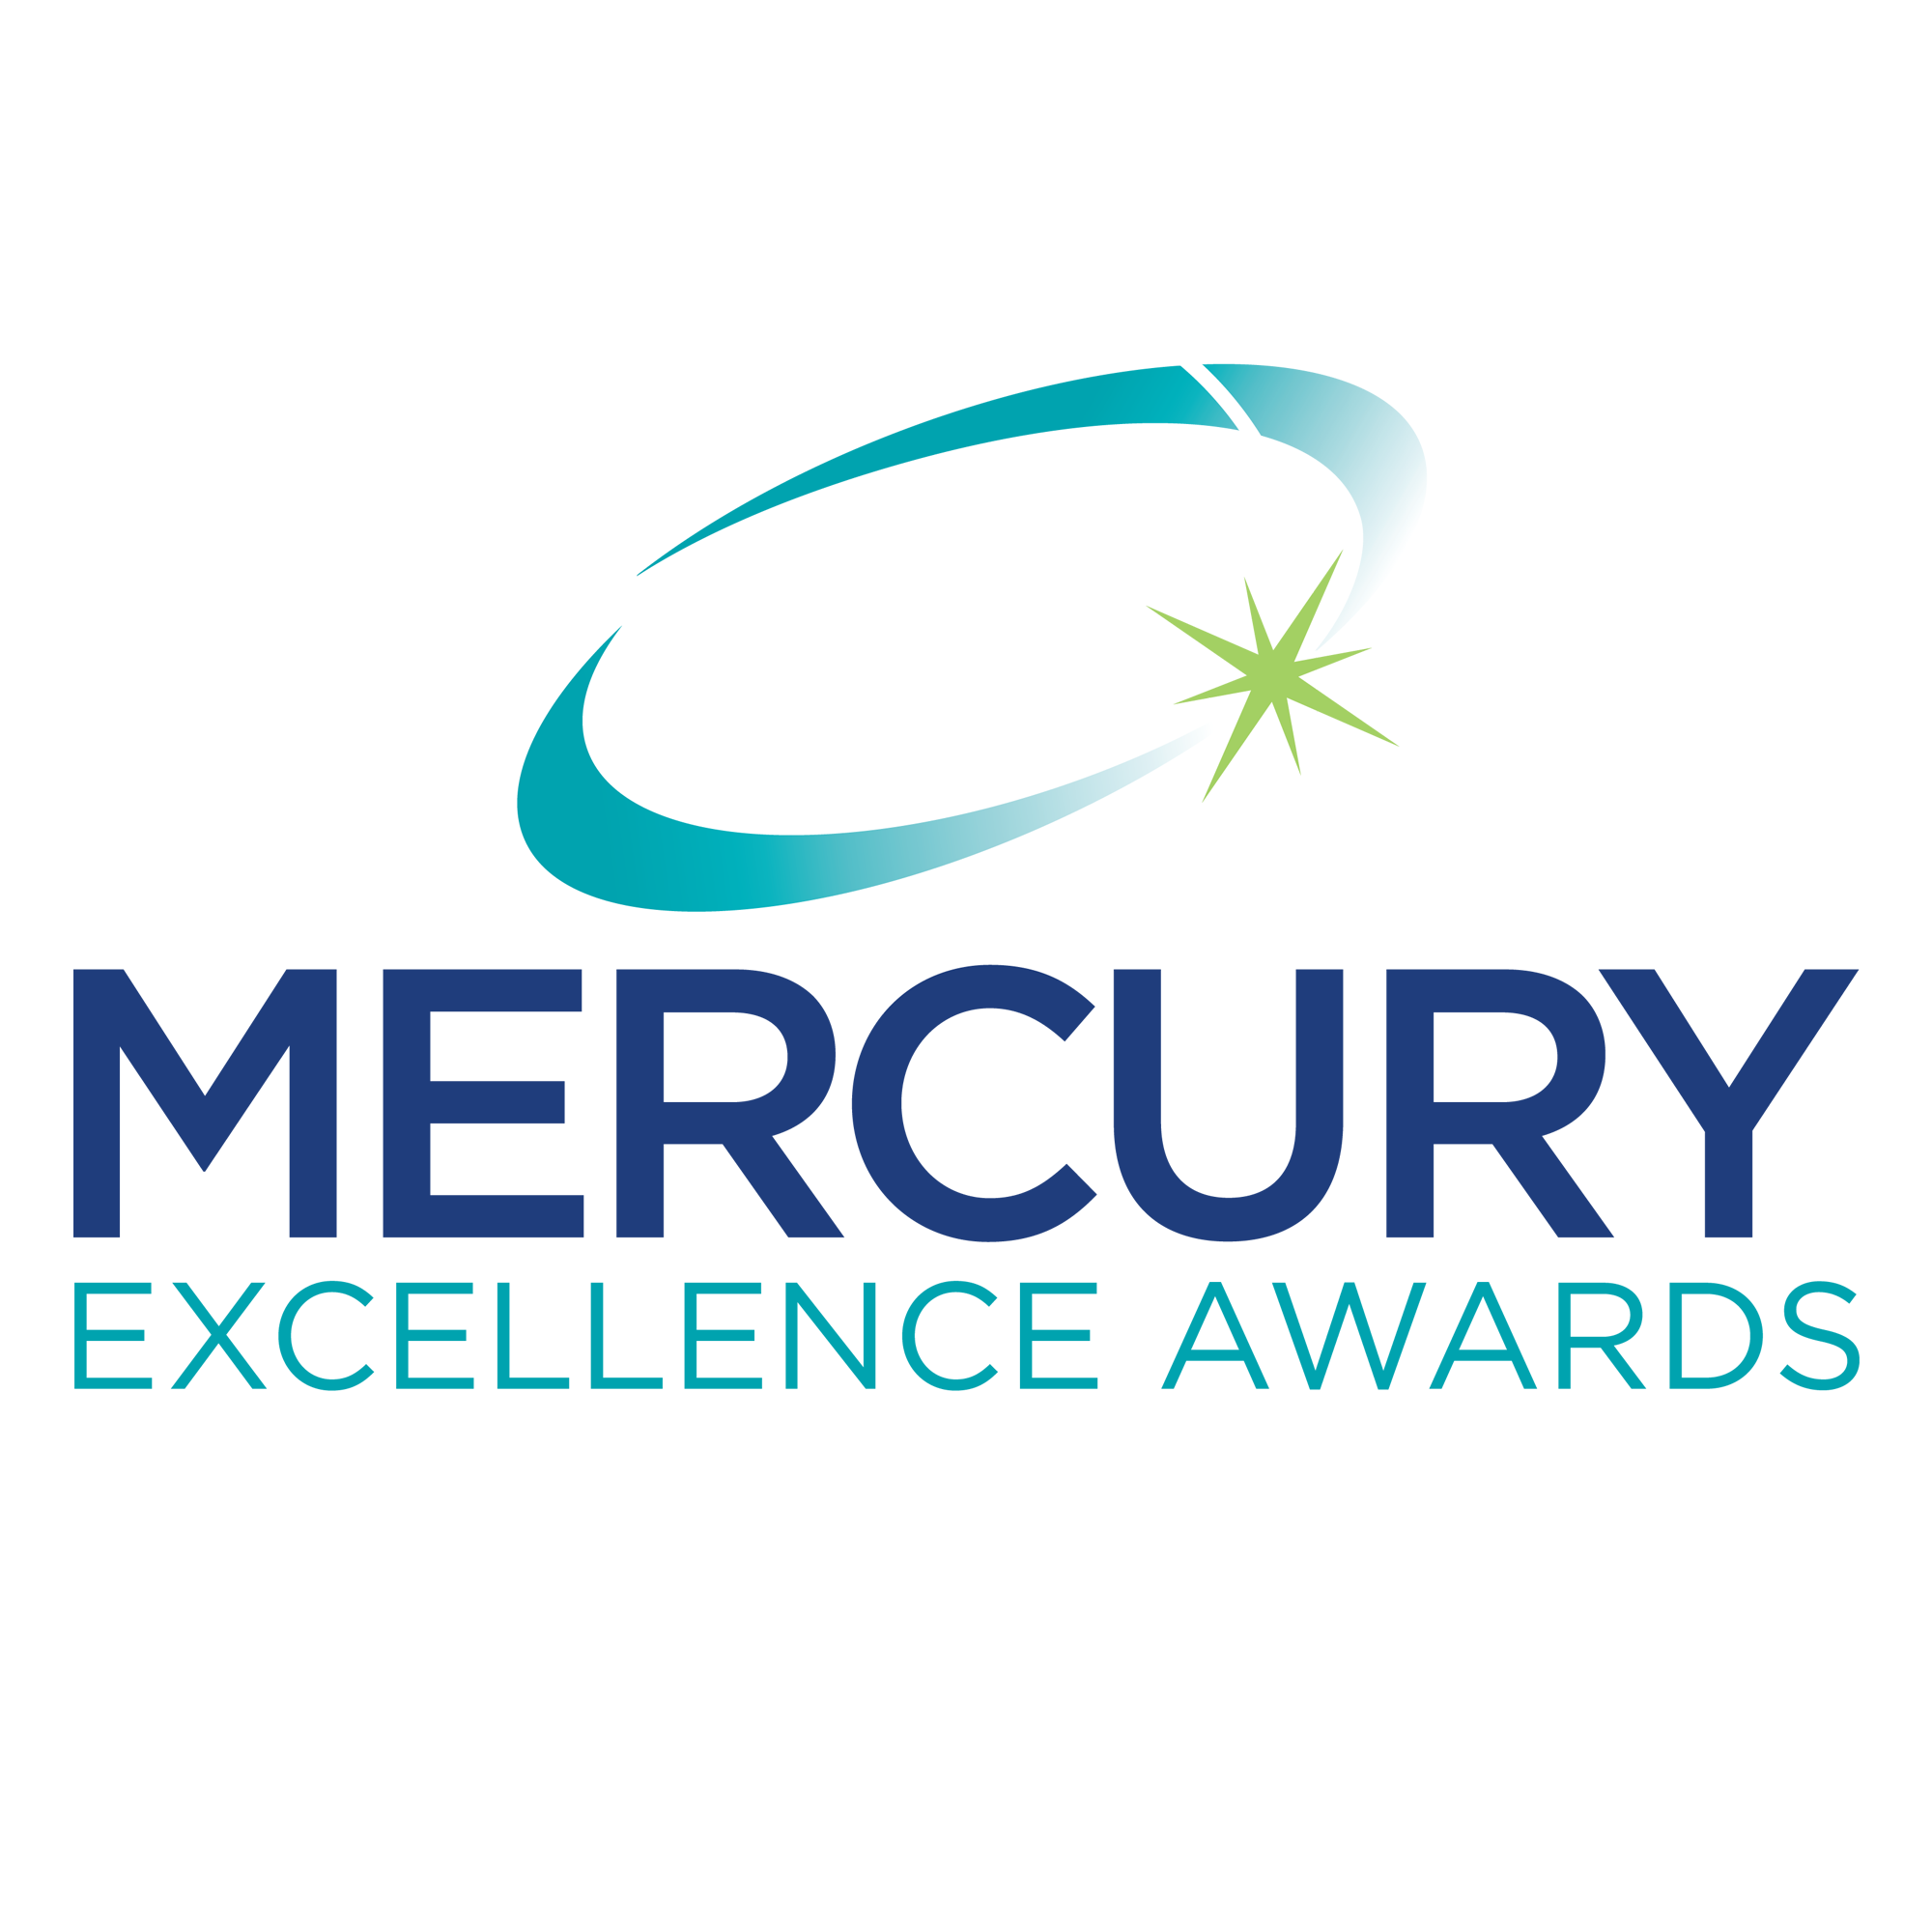 (MerComm) Mercury Excellence Awards